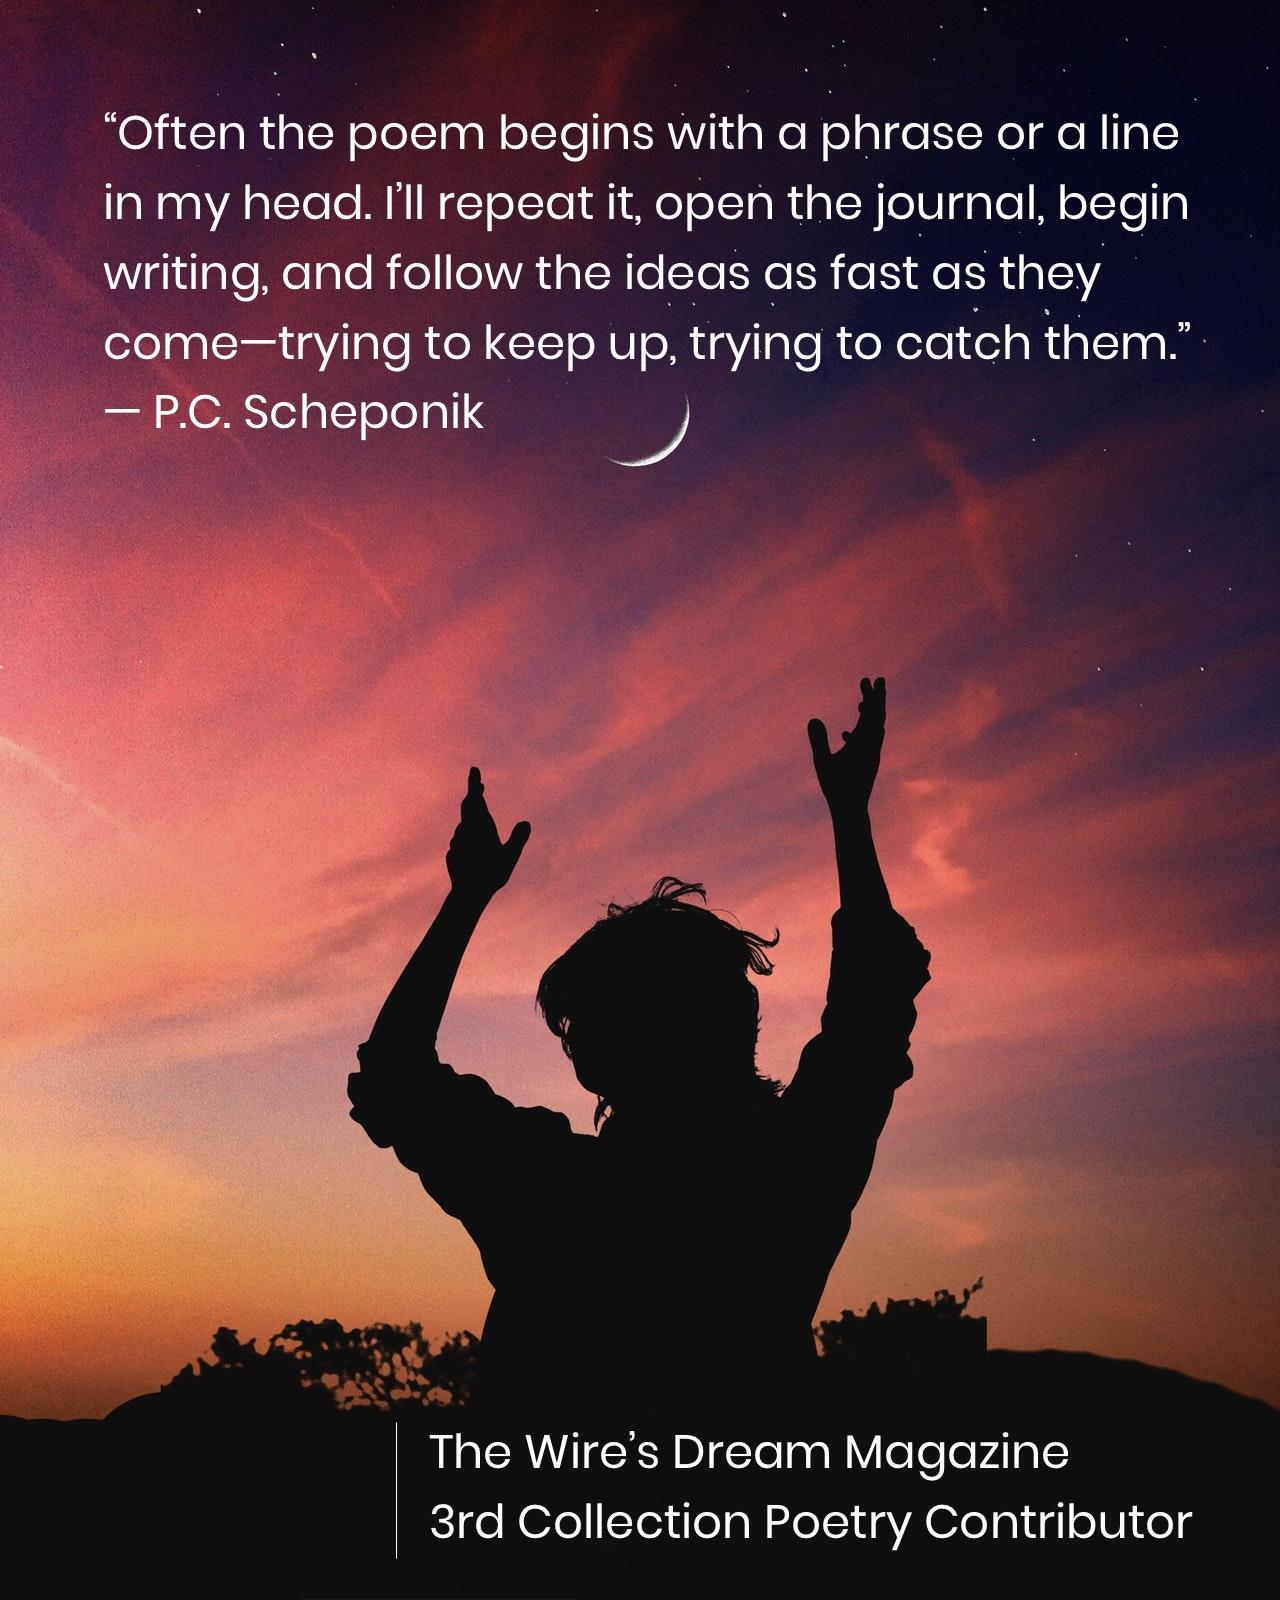 TWD Magazine 3rd Collection Interview: P.C. Scheponik — Poetry Contributor